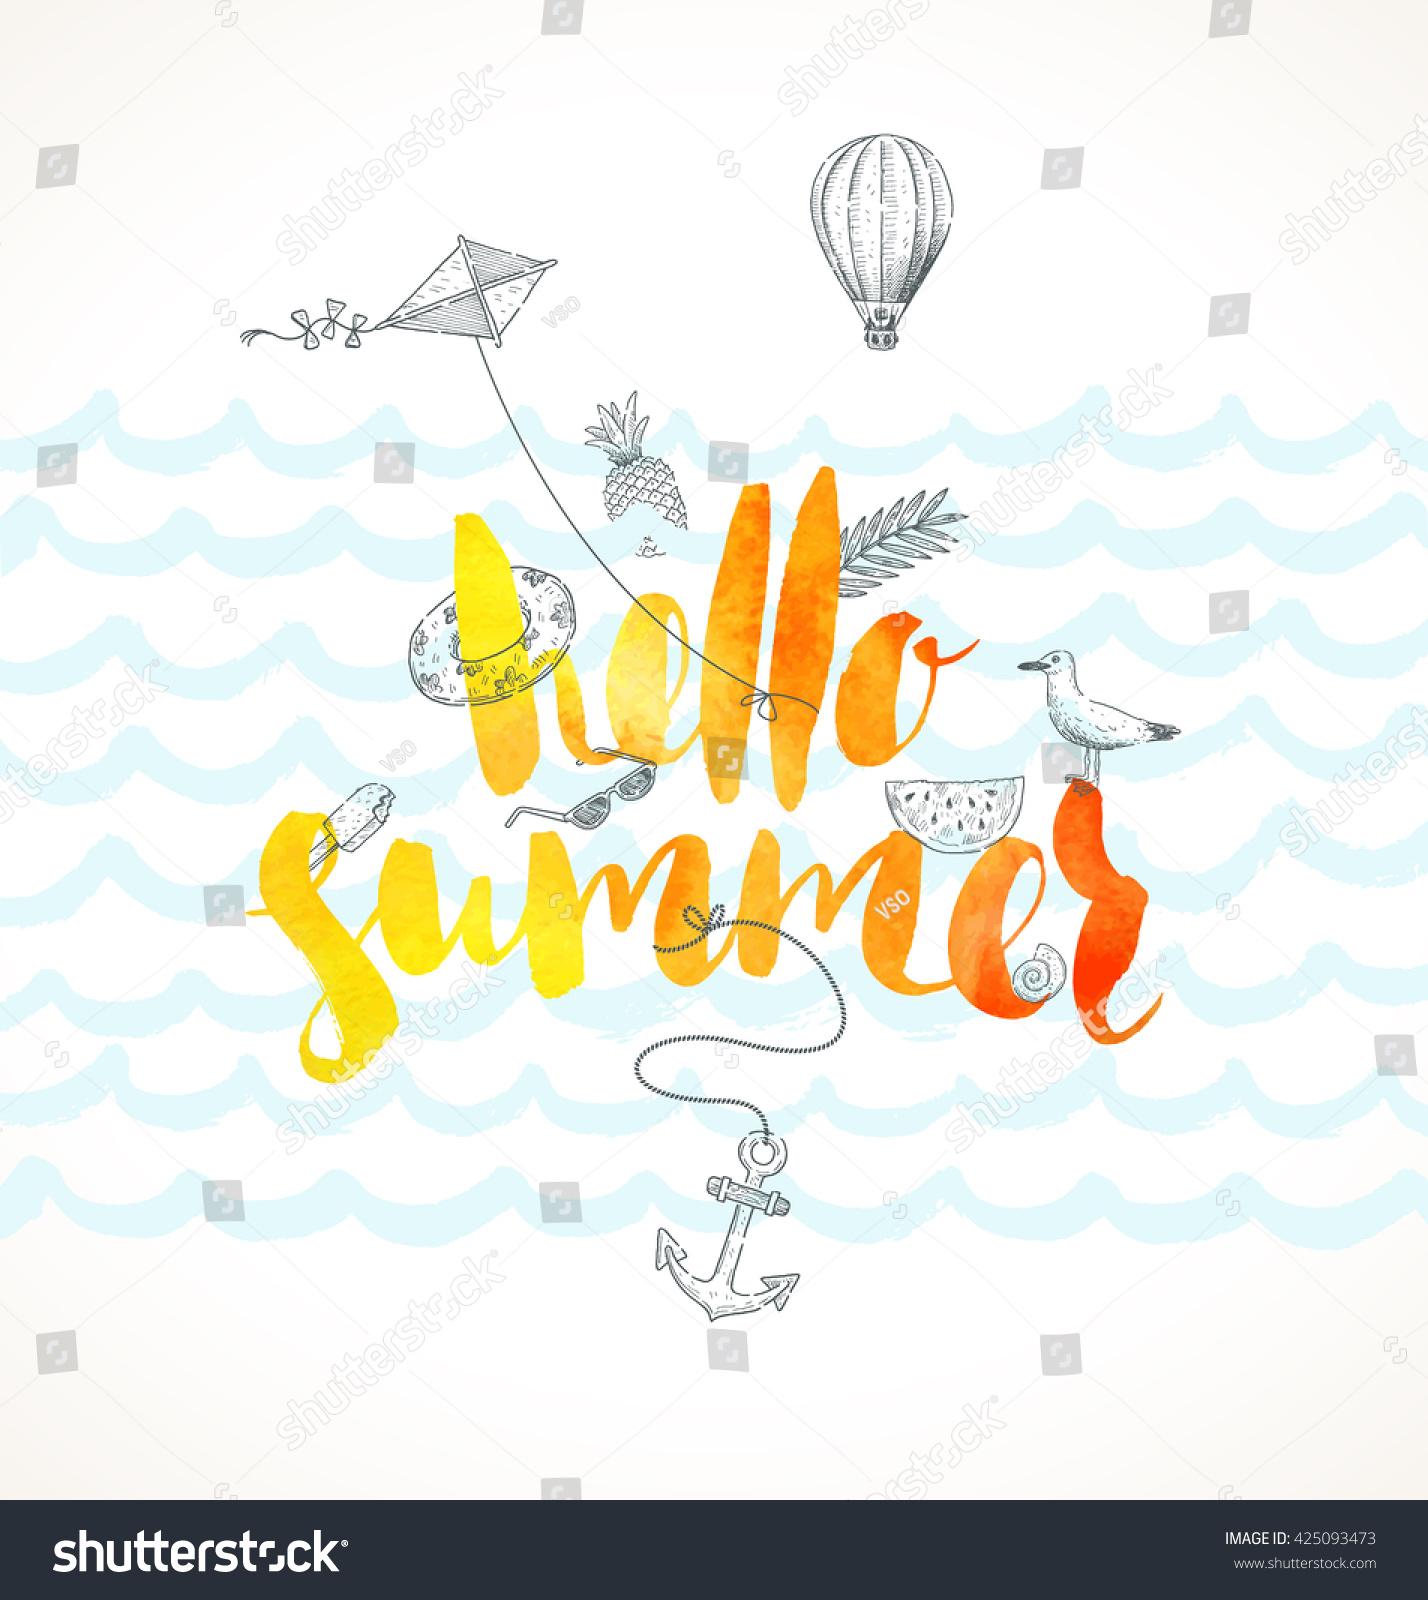 Hello Summer. Summer Holidays Vector Illustration. Handwritten Watercolor  Brush Calligraphy And Hand Drawn Summer